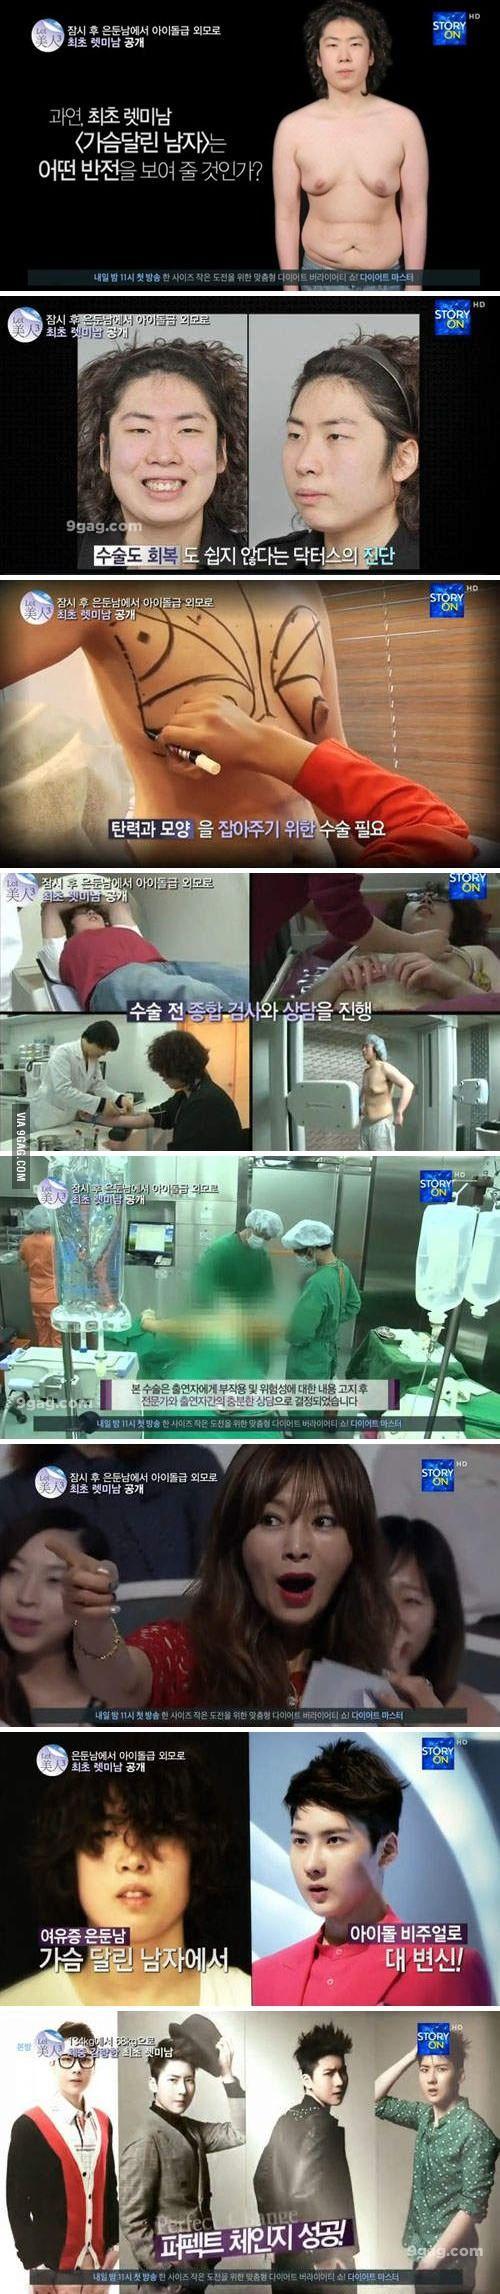 Korean surgery really scared me now